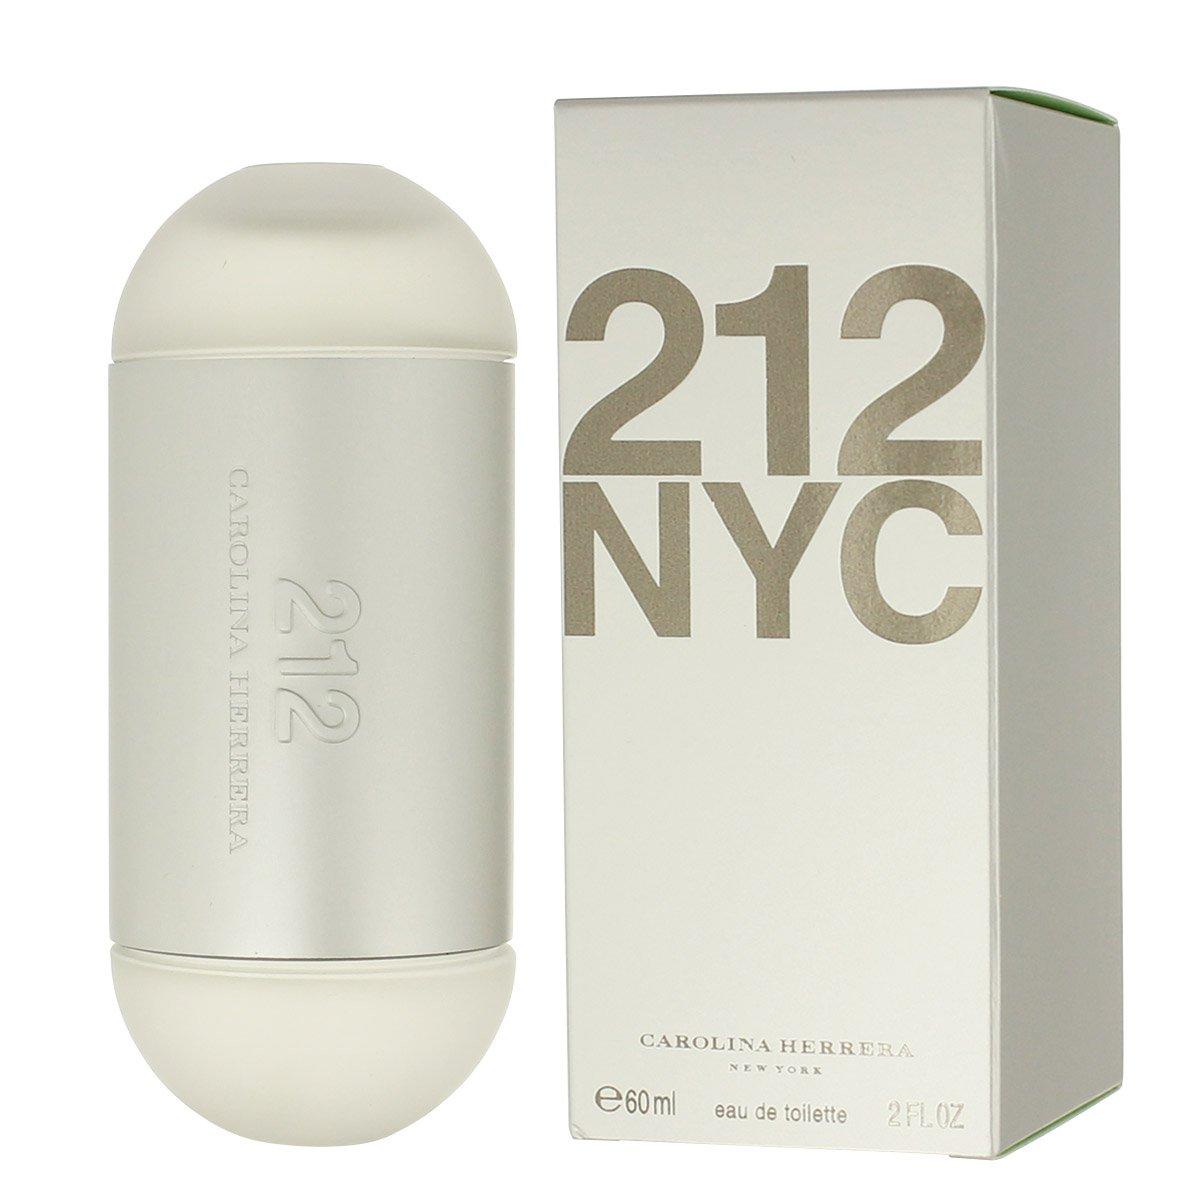 212 NYC Sales by Carolina Herrera for Women High material de Toilette Eau 2 Spray O